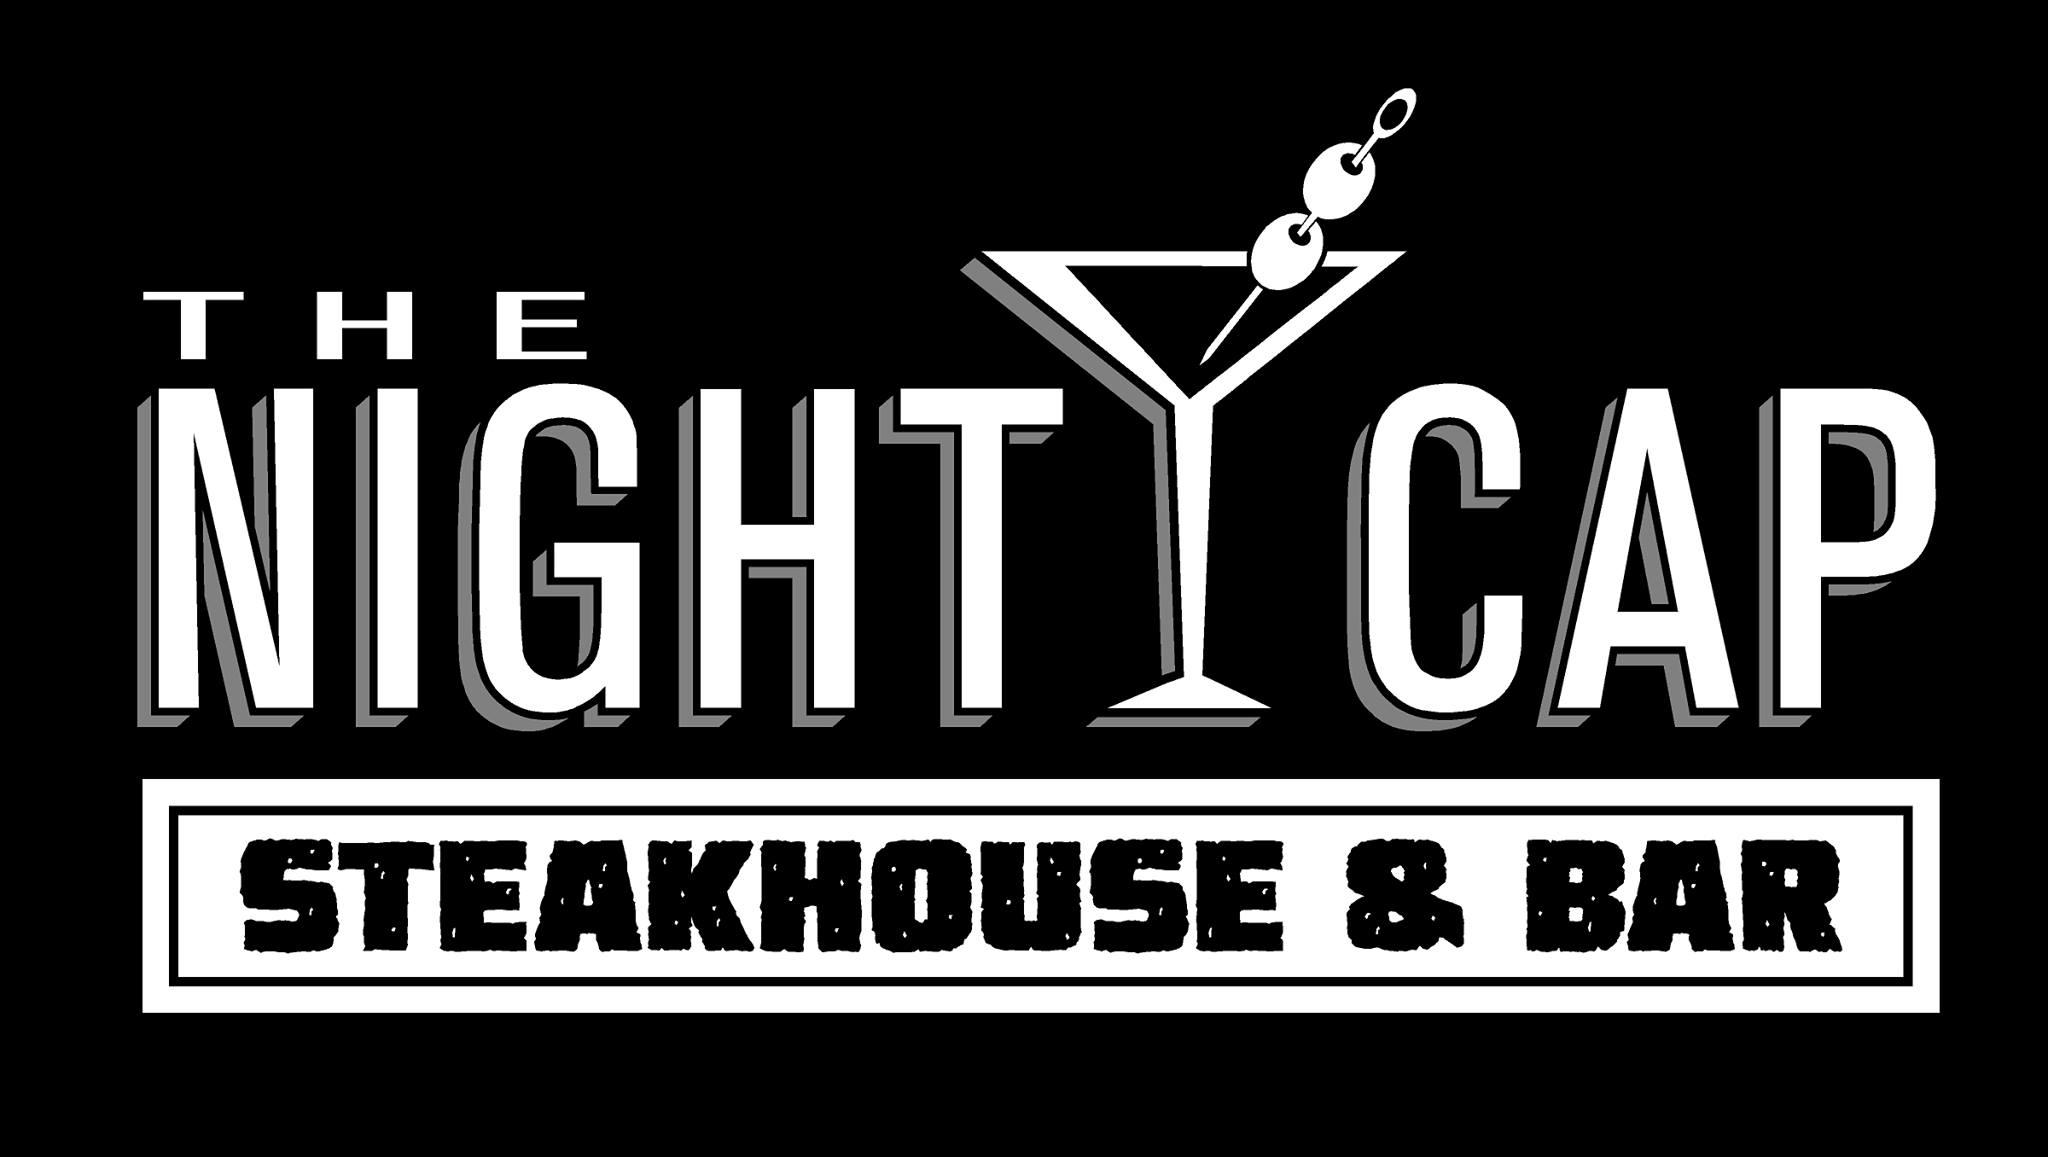 The Nightcap Steakhouse & Bar